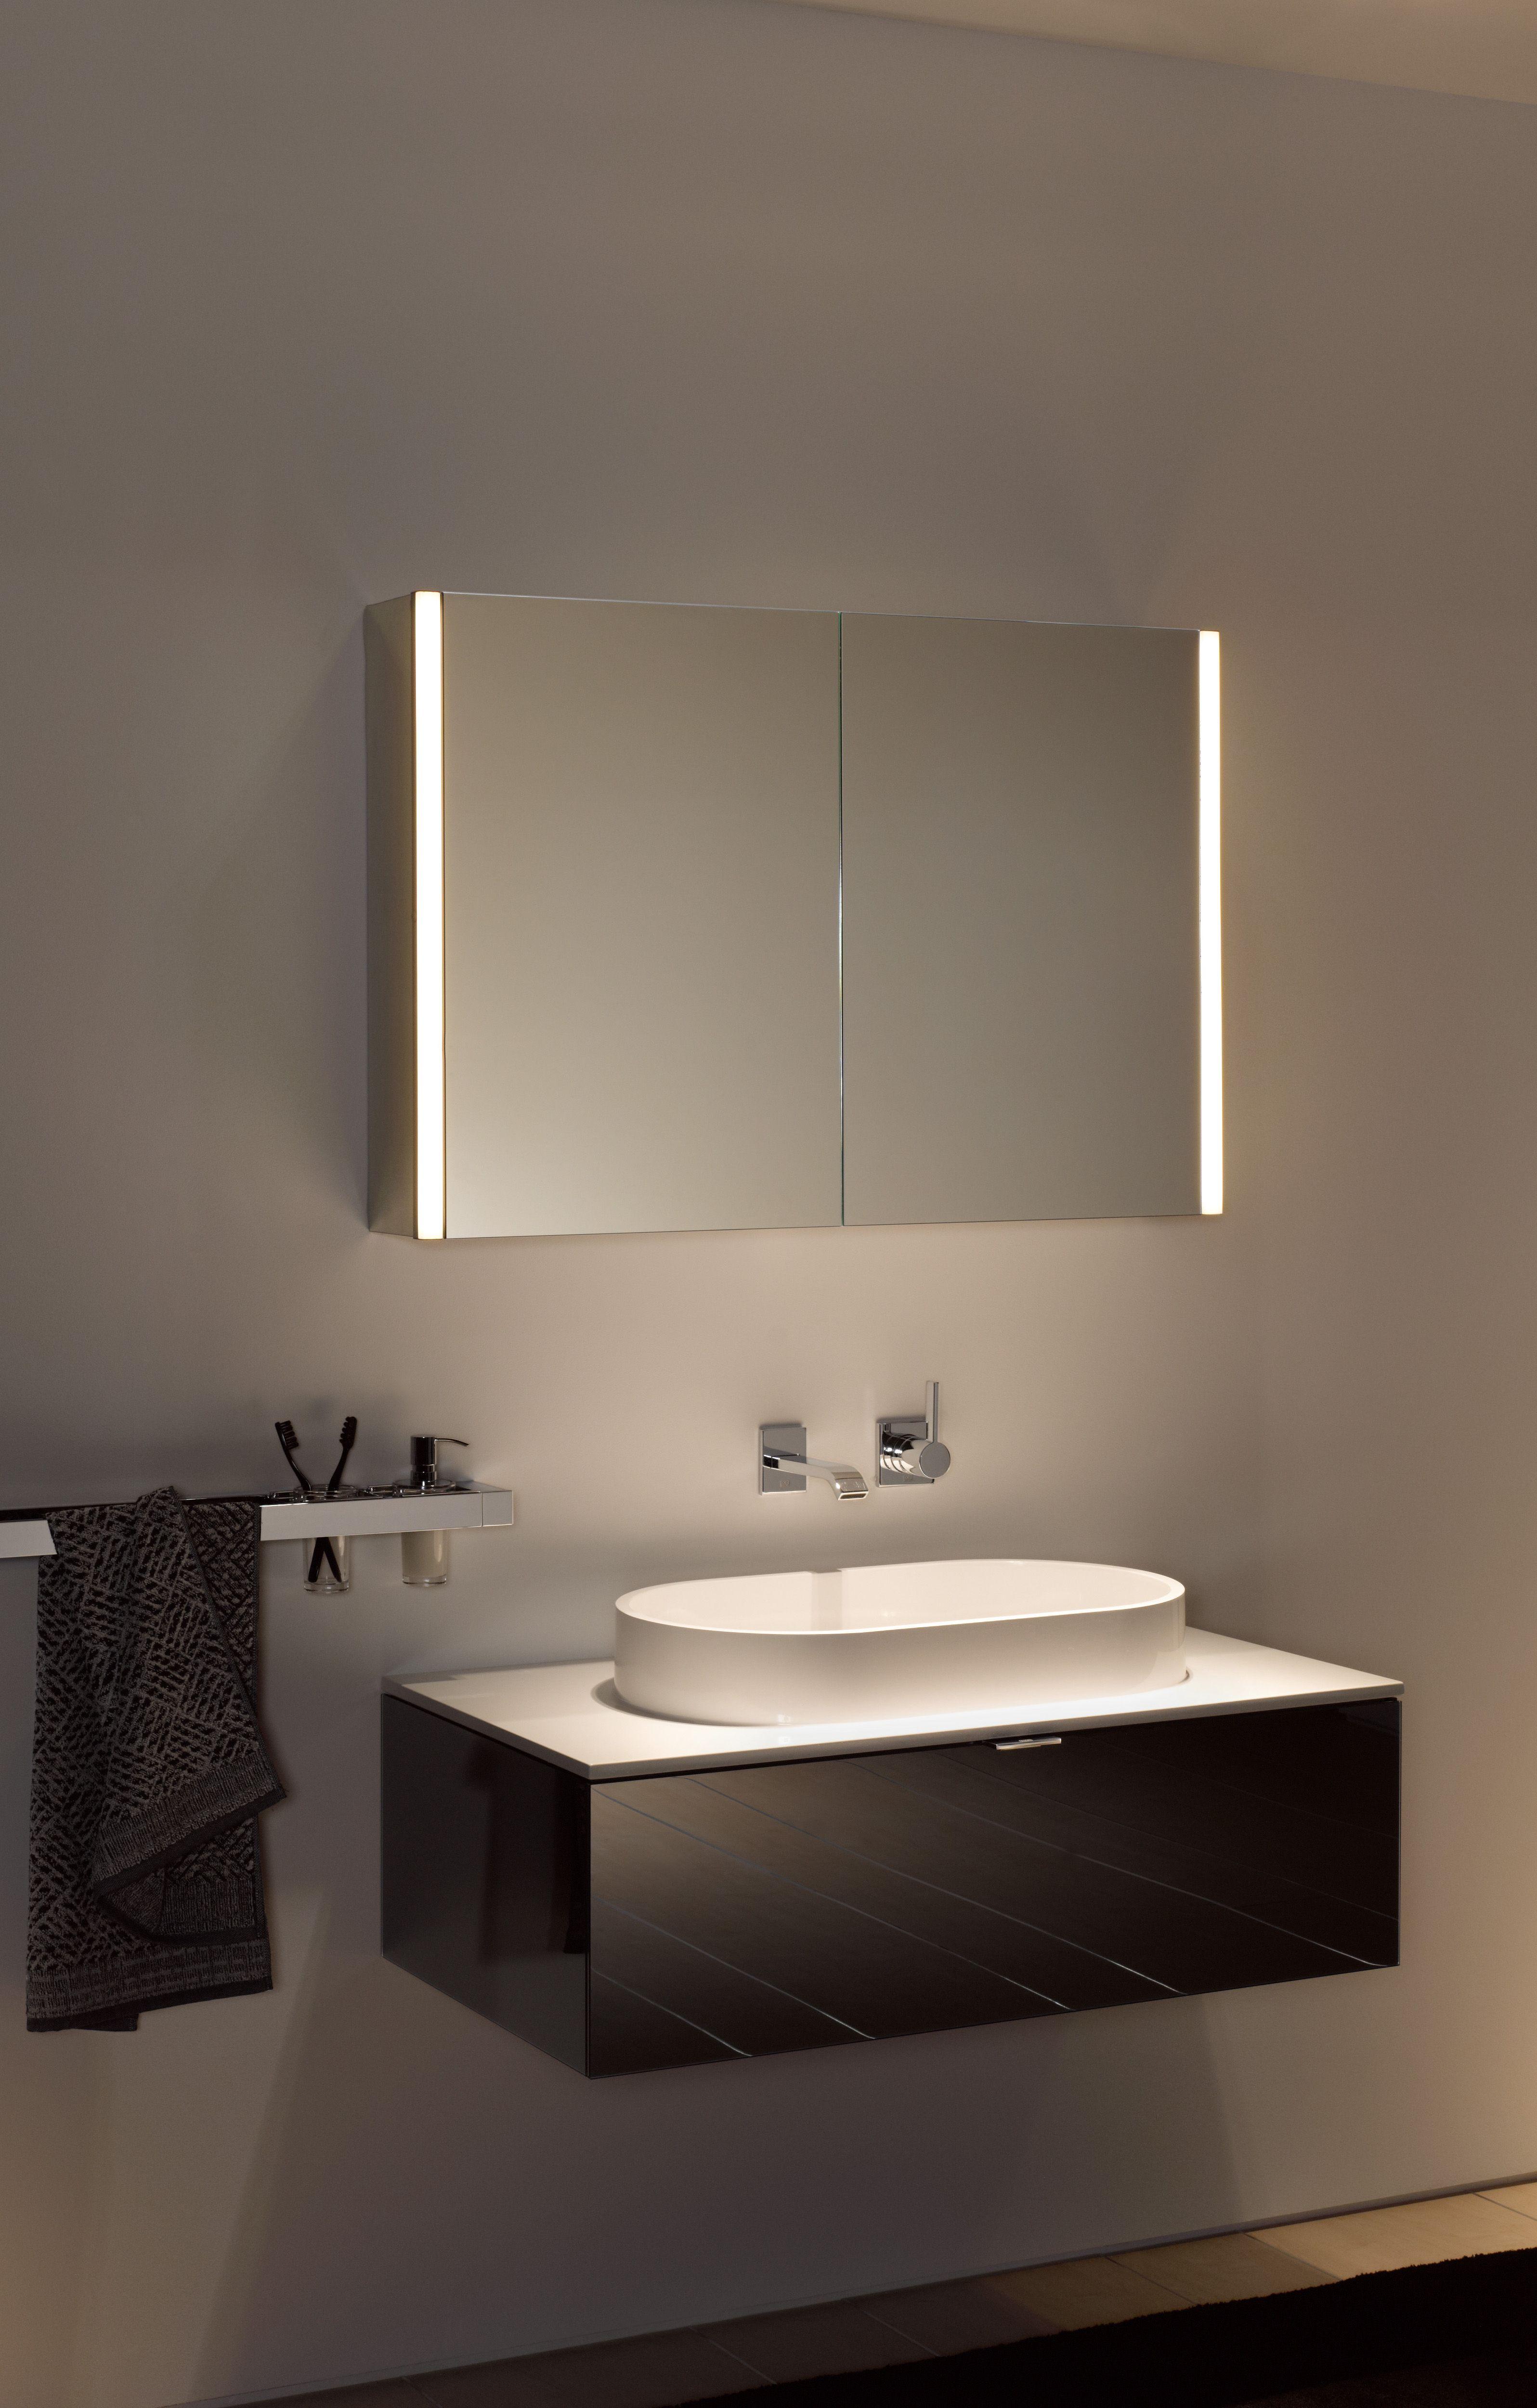 Emco Asis Select Badezimmer Mobel Badezimmer Spiegelschrank